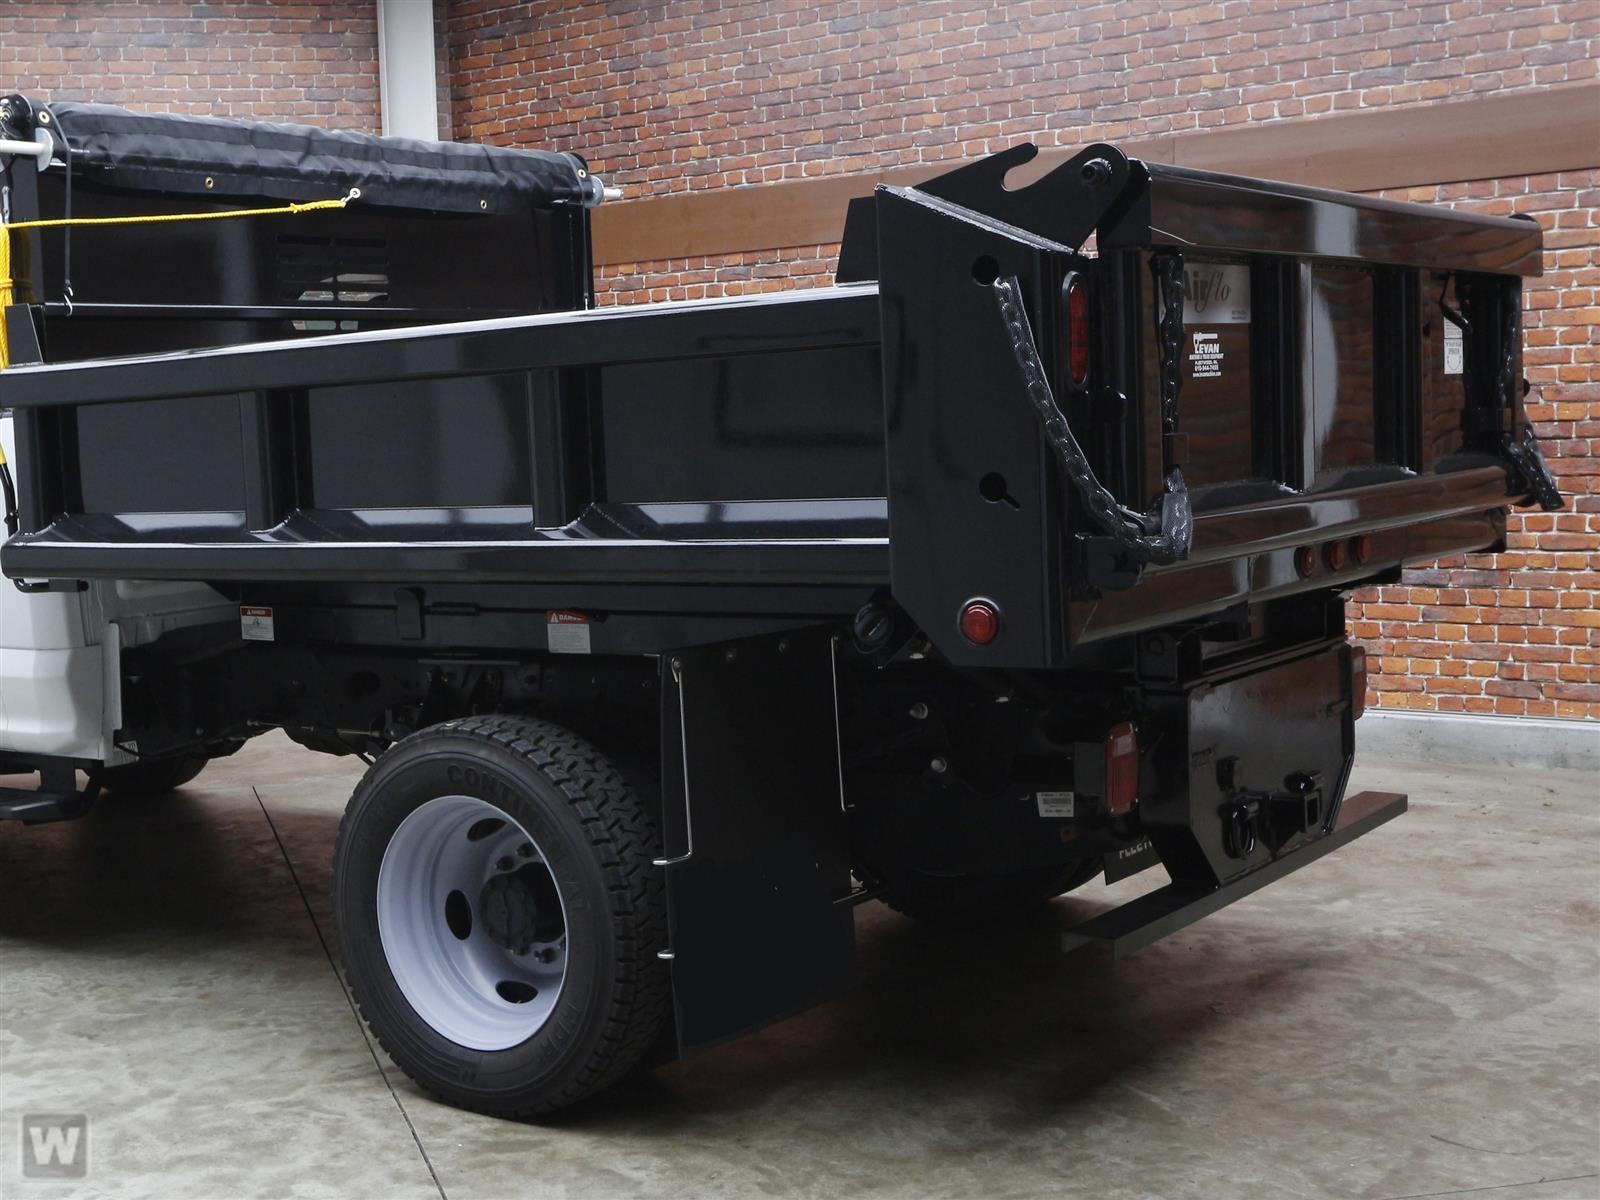 2020 Ford F-550 Regular Cab DRW 4x4, Air-Flo Dump Body #202816 - photo 1